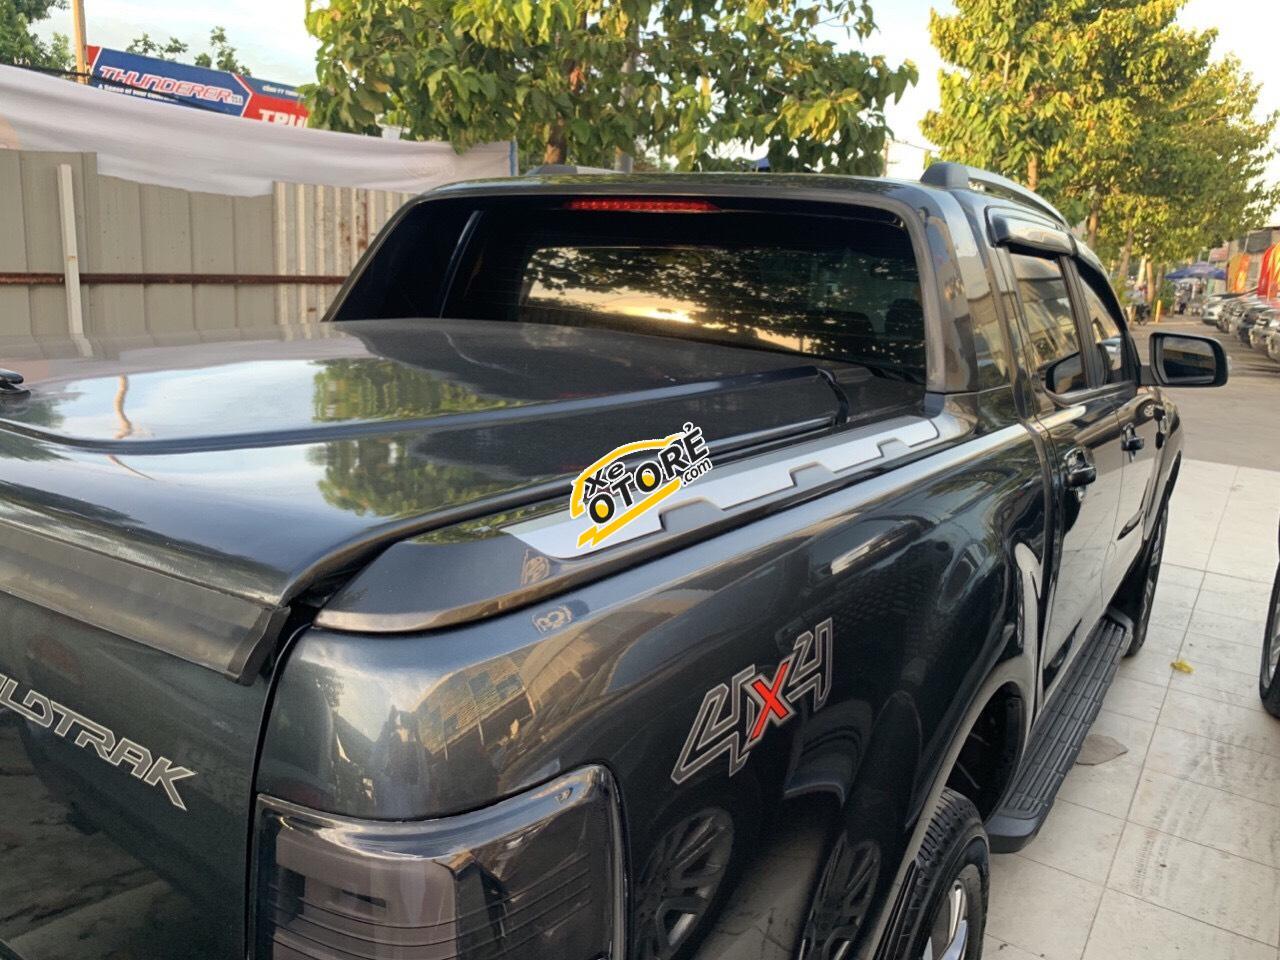 Bán xe Ranger Wildtrak 3.2 máy dầu, 2 cầu, màu xám